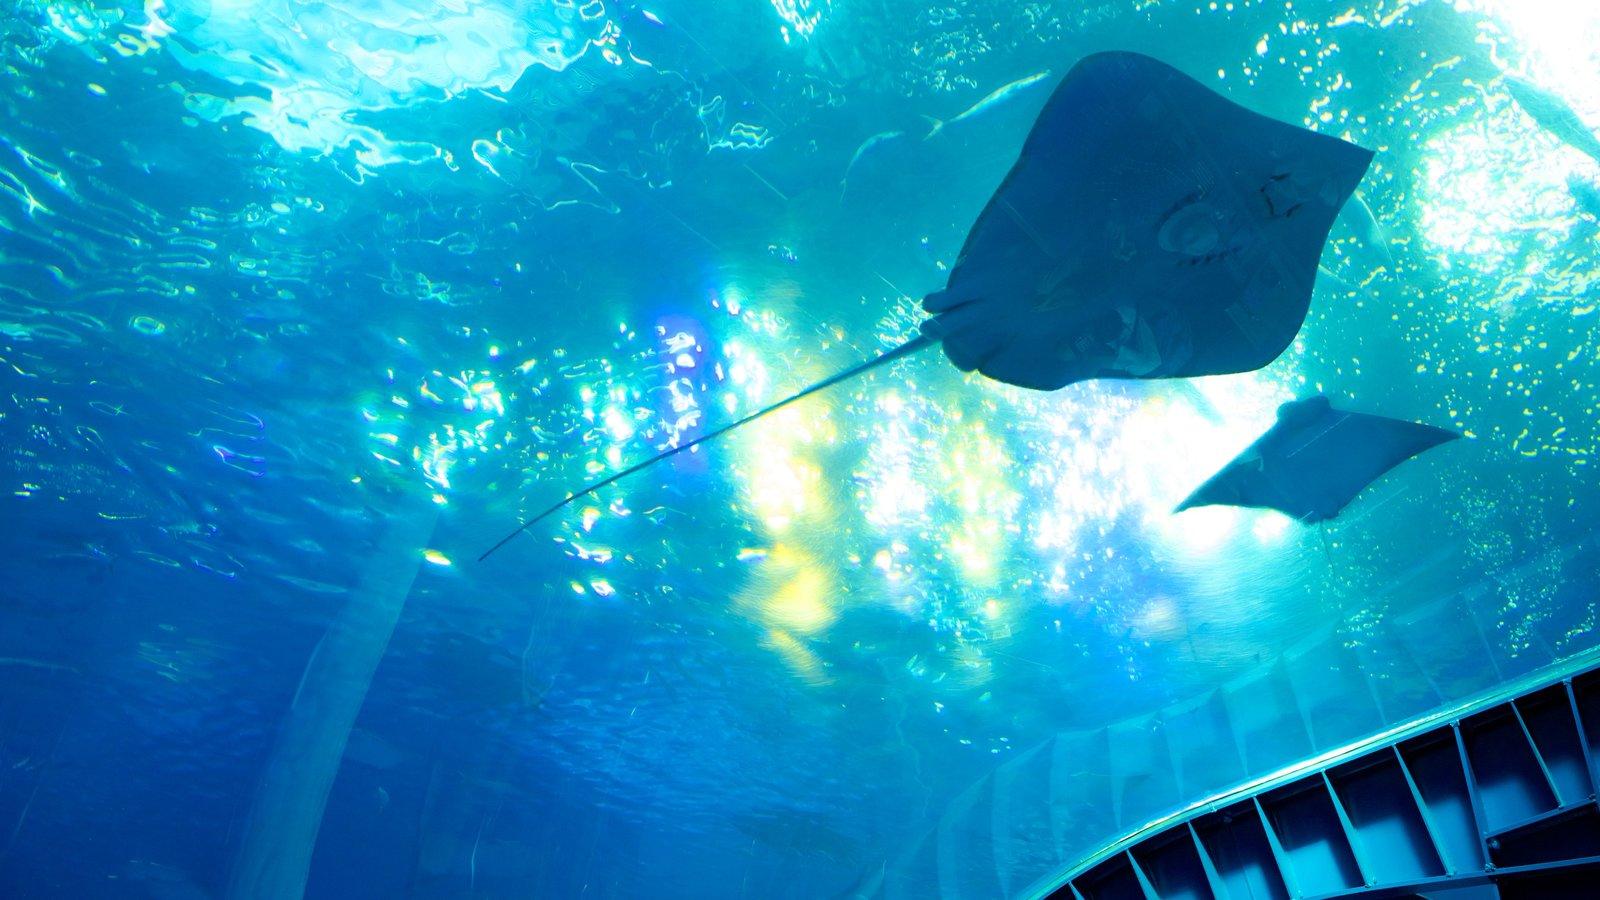 Okinawa Churaumi Aquarium which includes marine life